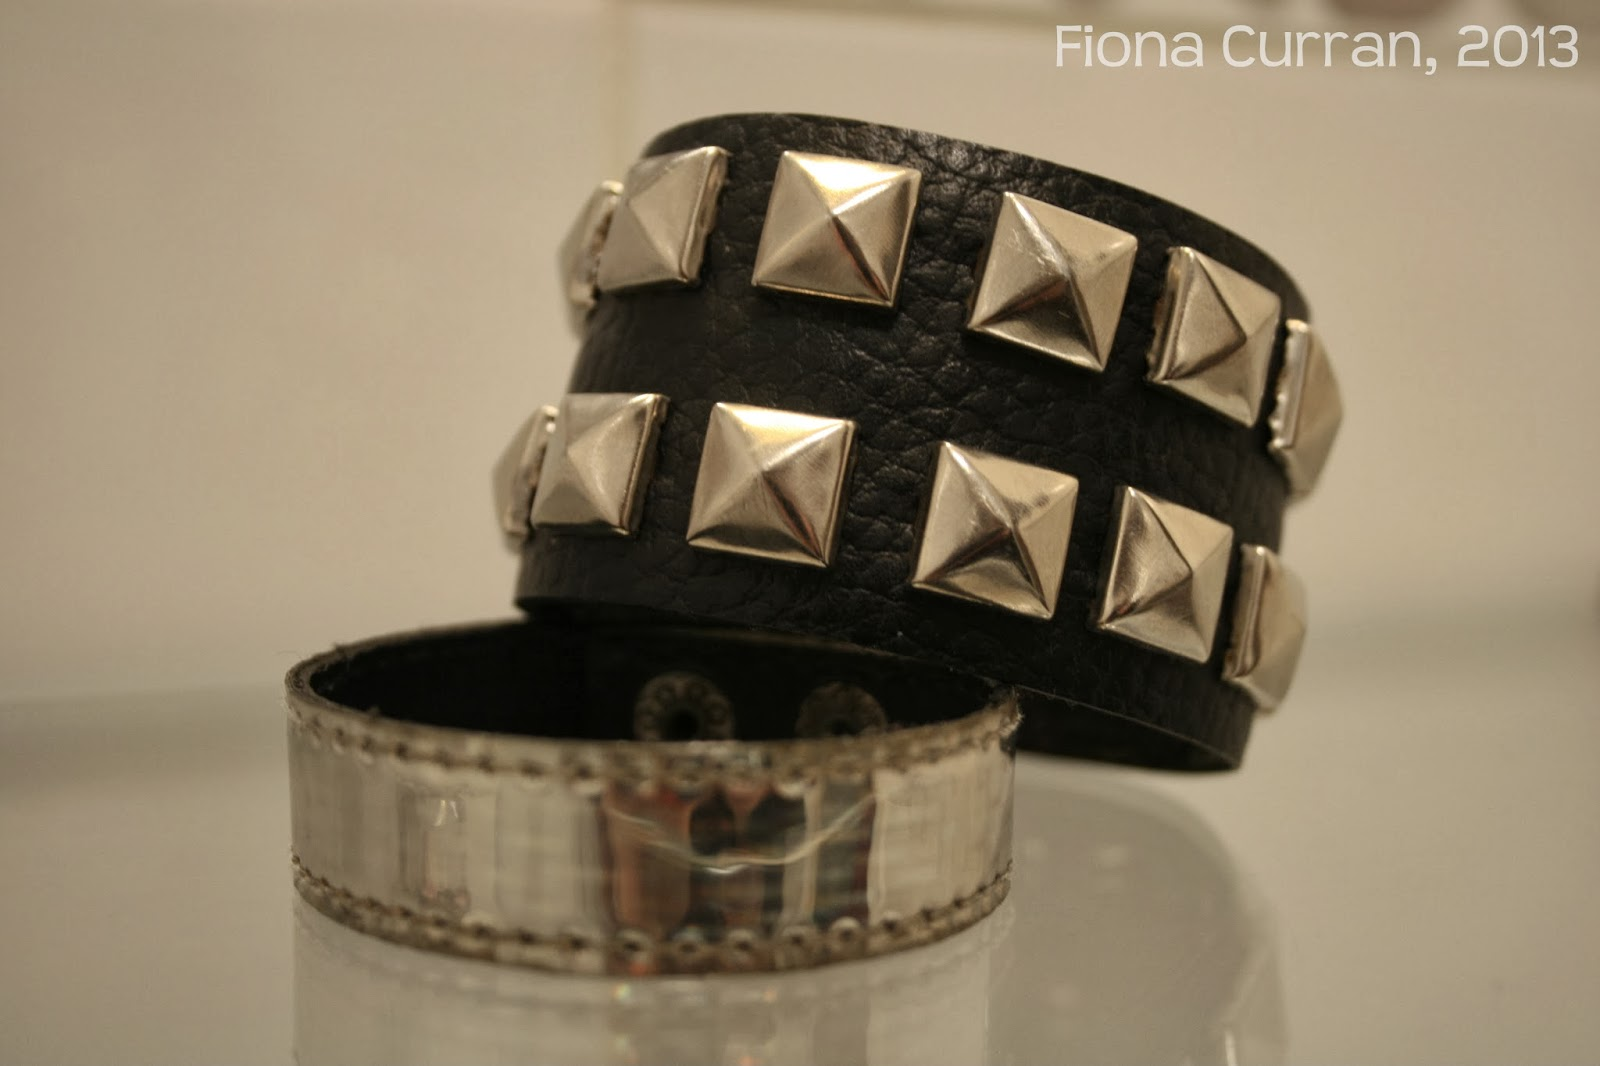 bracelet, cuff, studs, studded, goth